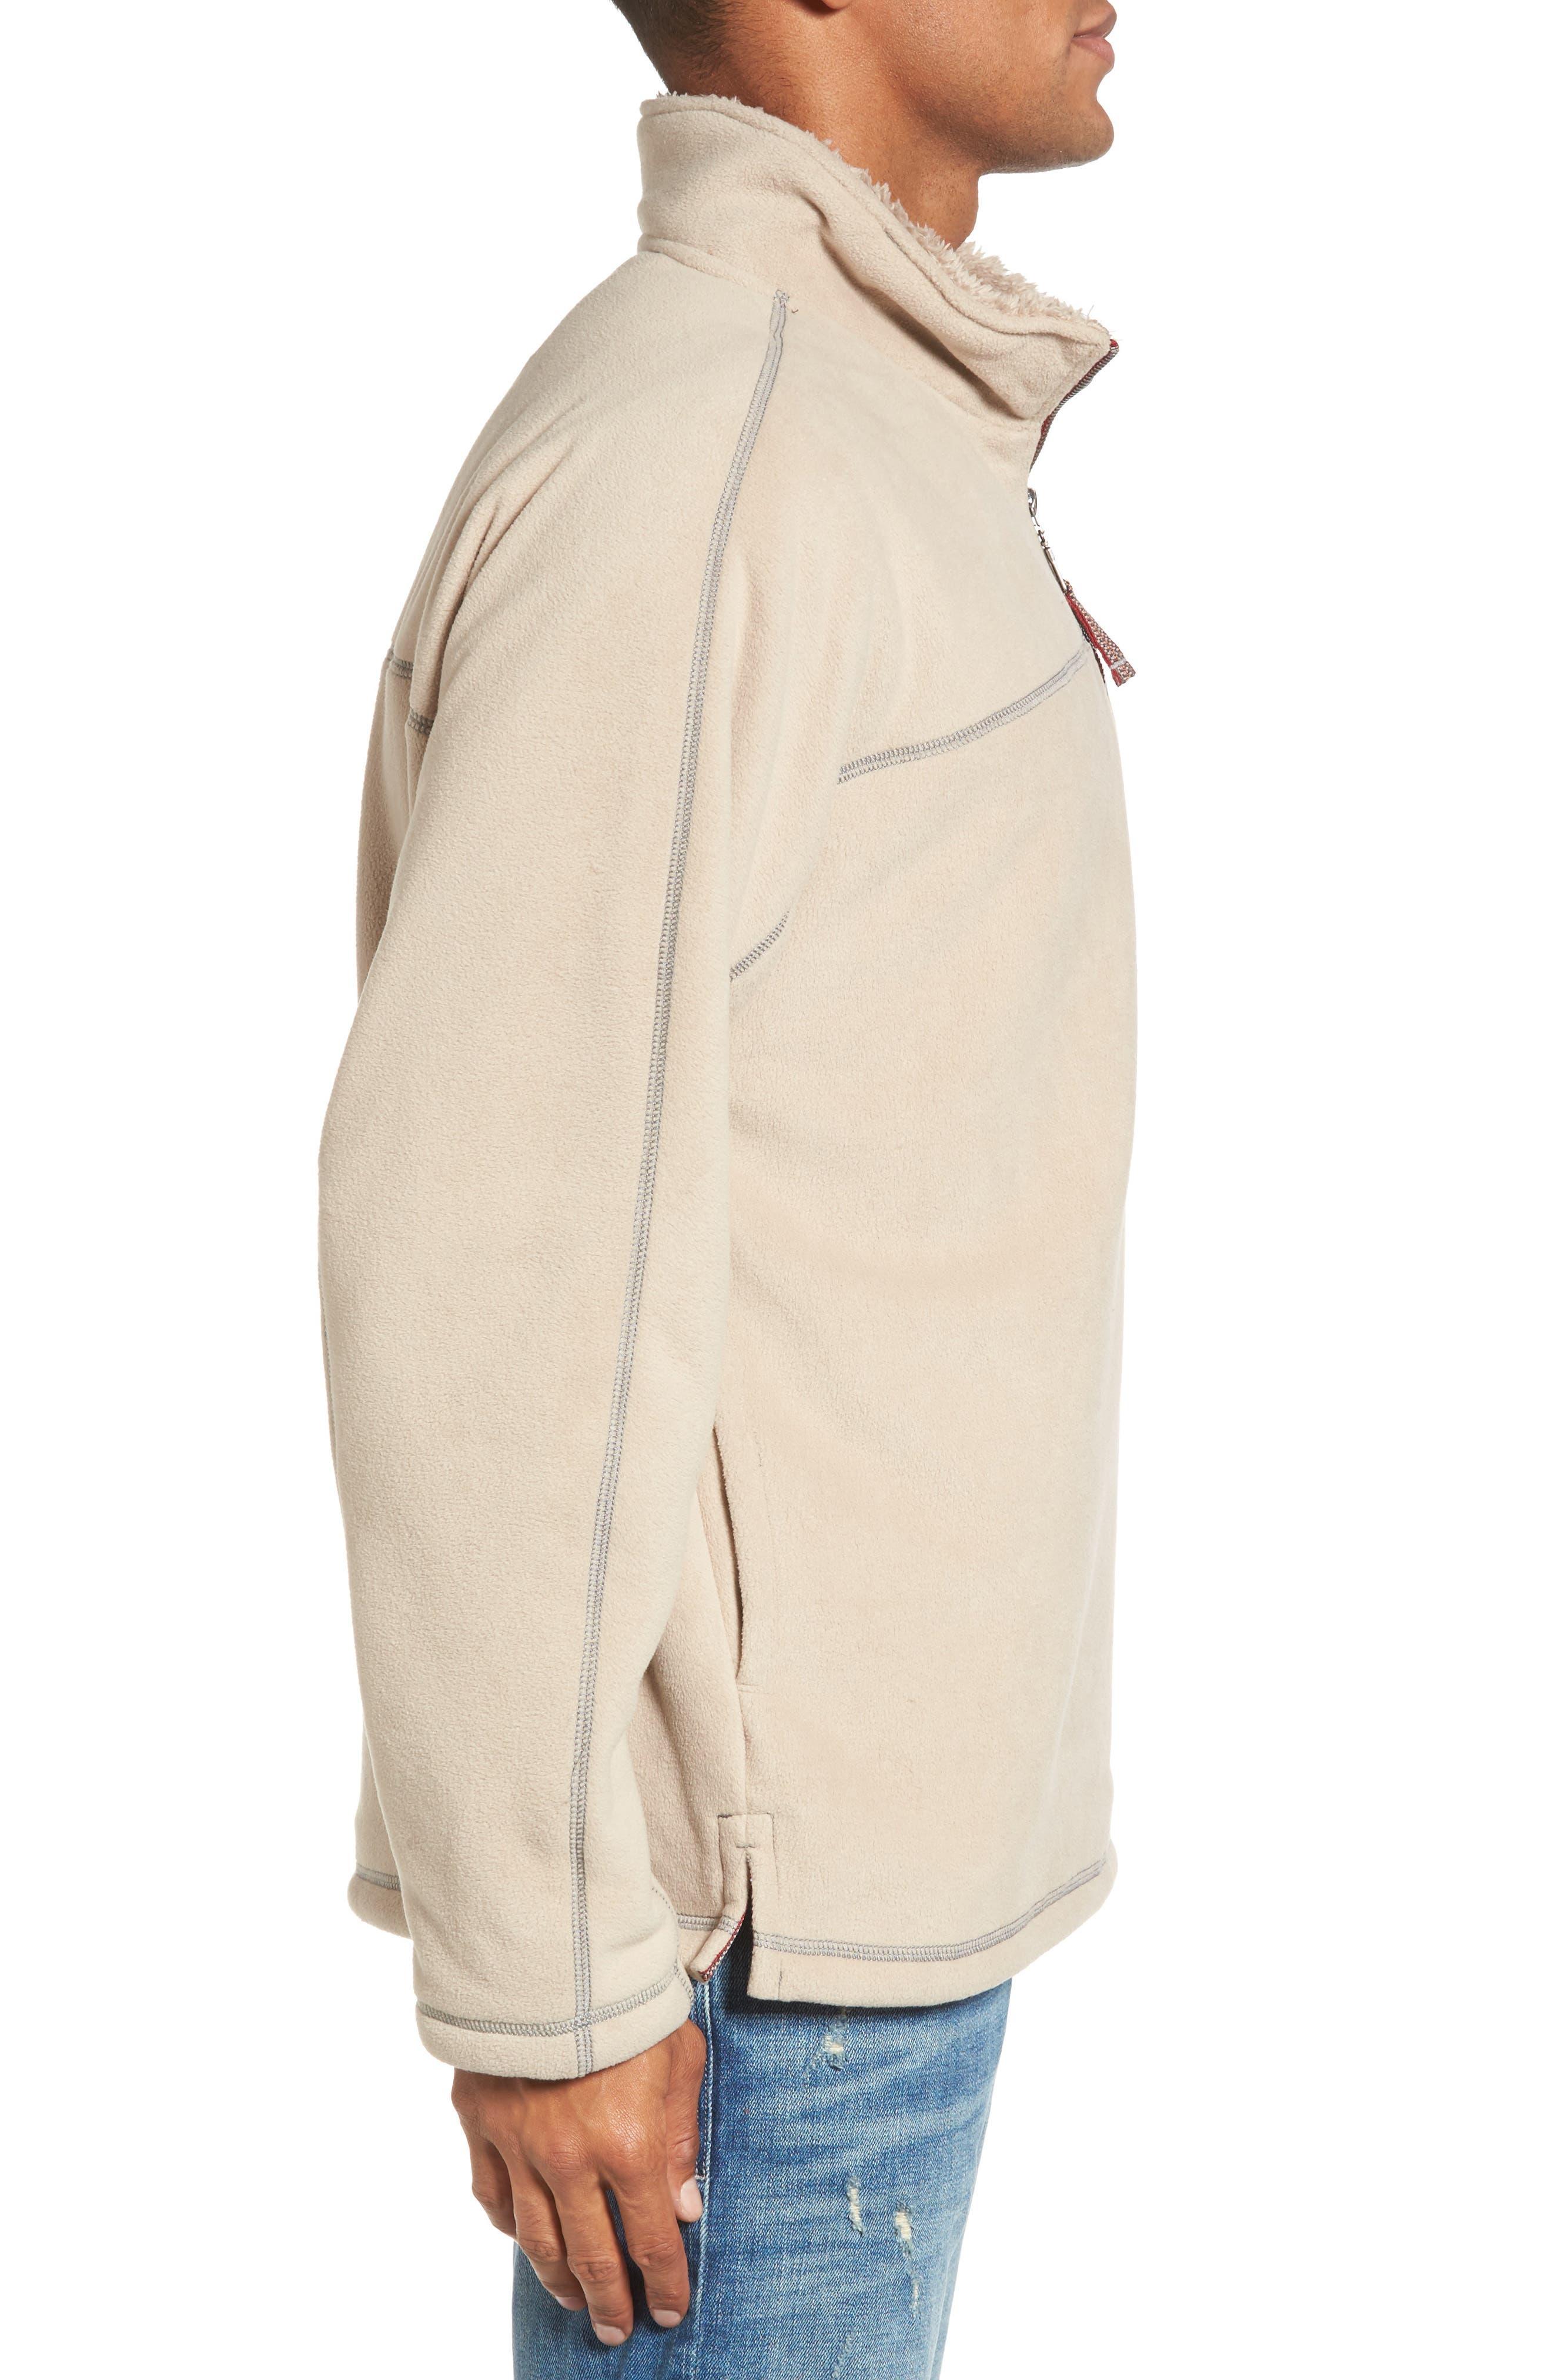 Bonded Polar Fleece Lined Pullover,                             Alternate thumbnail 3, color,                             249